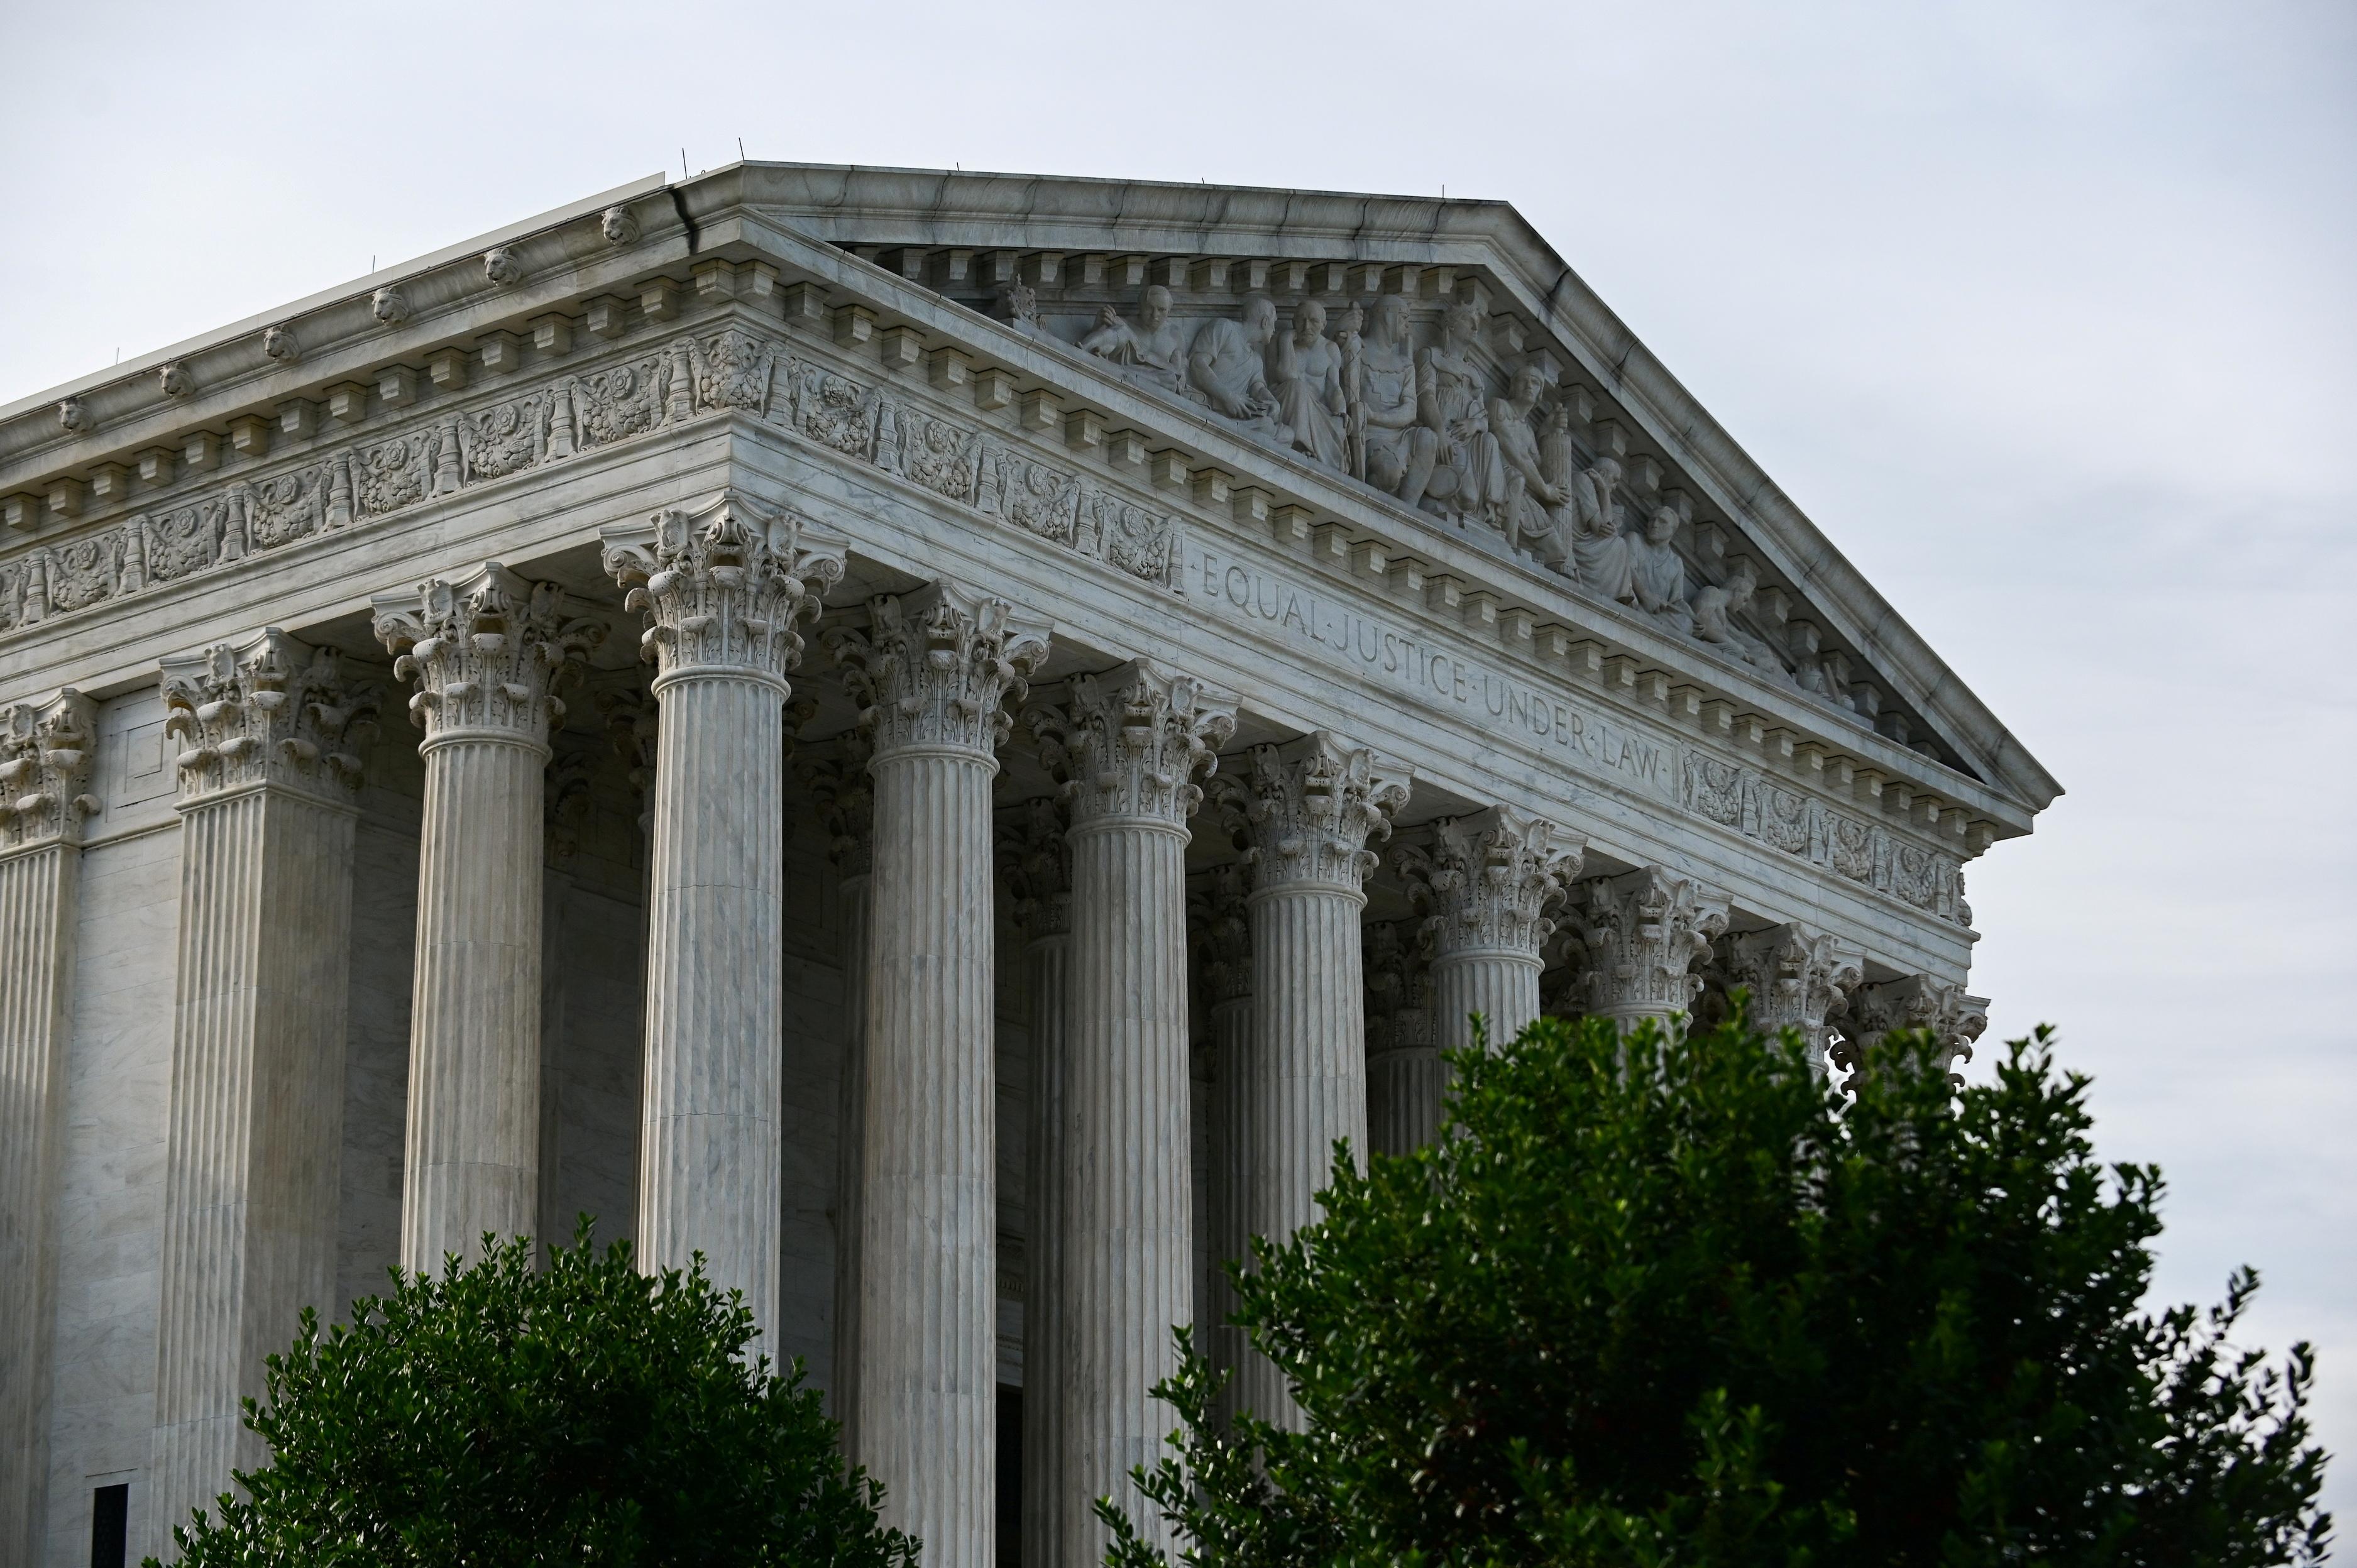 A view of the U.S. Supreme Court in Washington, U.S., June 1, 2021. REUTERS/Erin Scott/File Photo